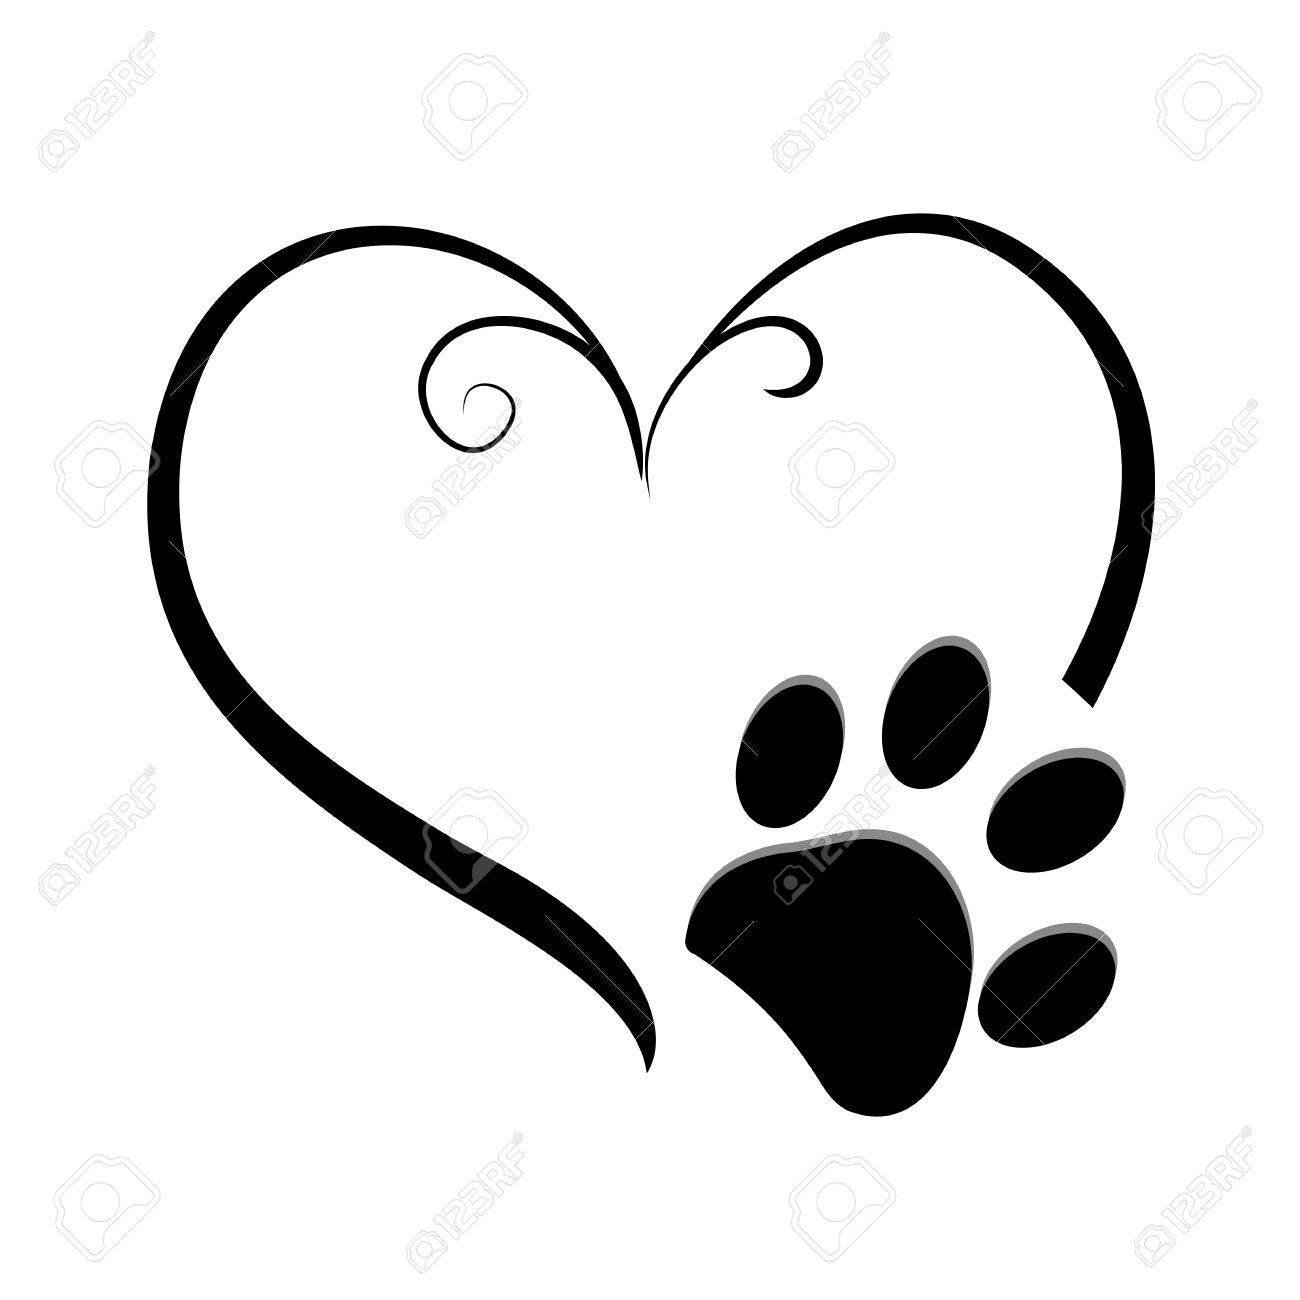 Dog paw prints with heart symbol  Tattoo design, vector illustration